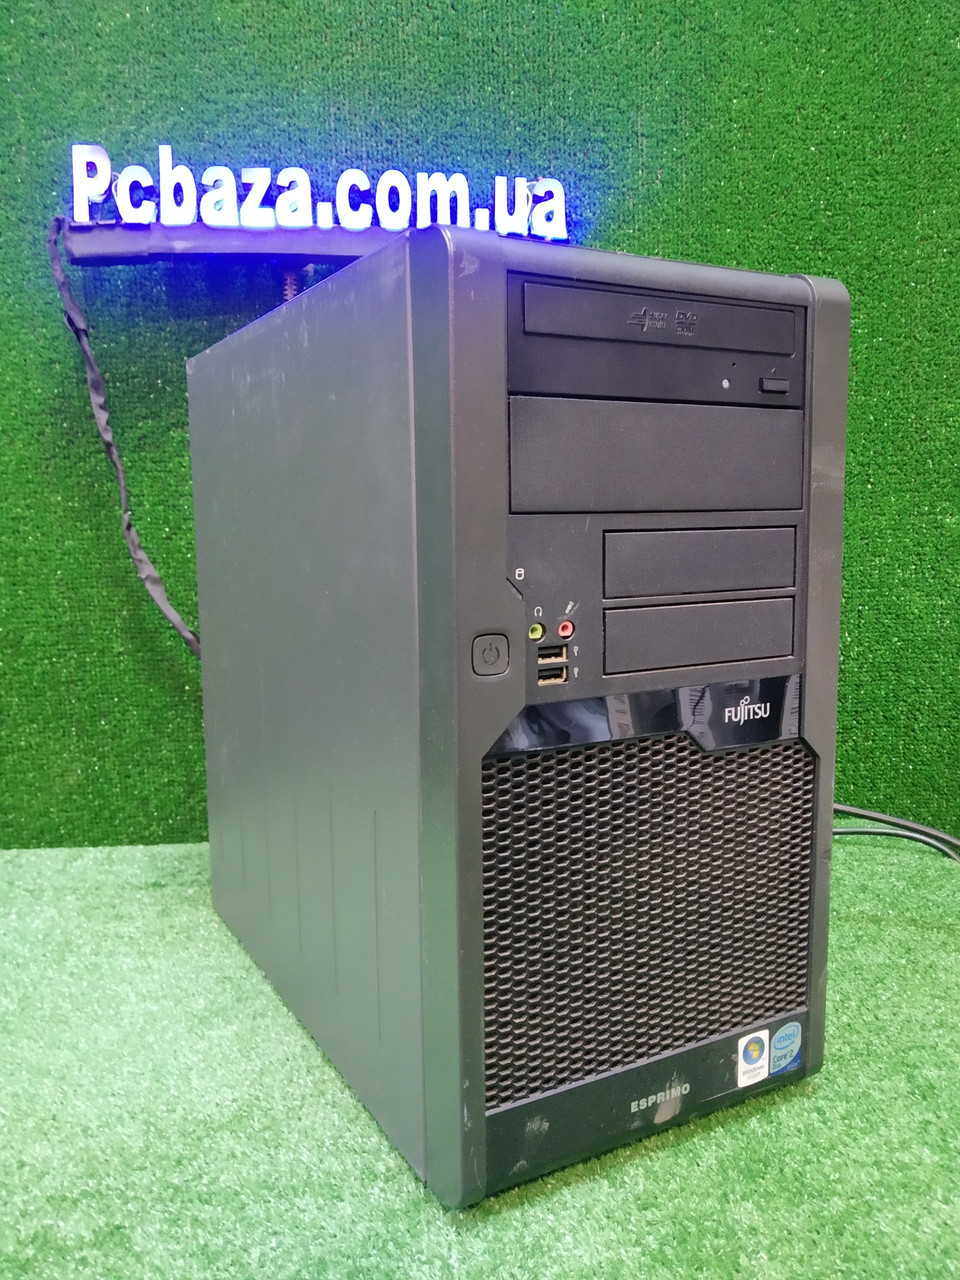 Компьютер Fujitsu, Intel 2 мощных ядра E8400 3.0Ггц, 4 ГБ, 160 ГБ Настроен! Есть Опт! Гарантия!